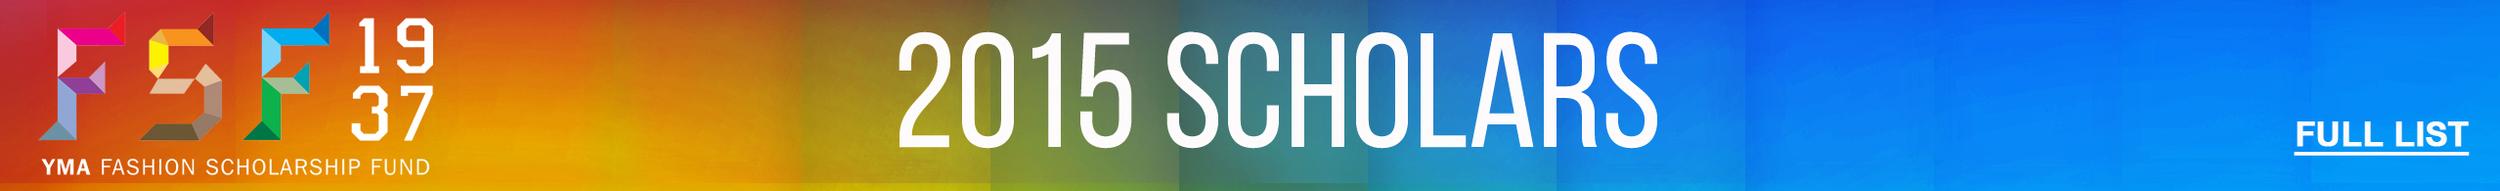 2015 scholars bar.jpg